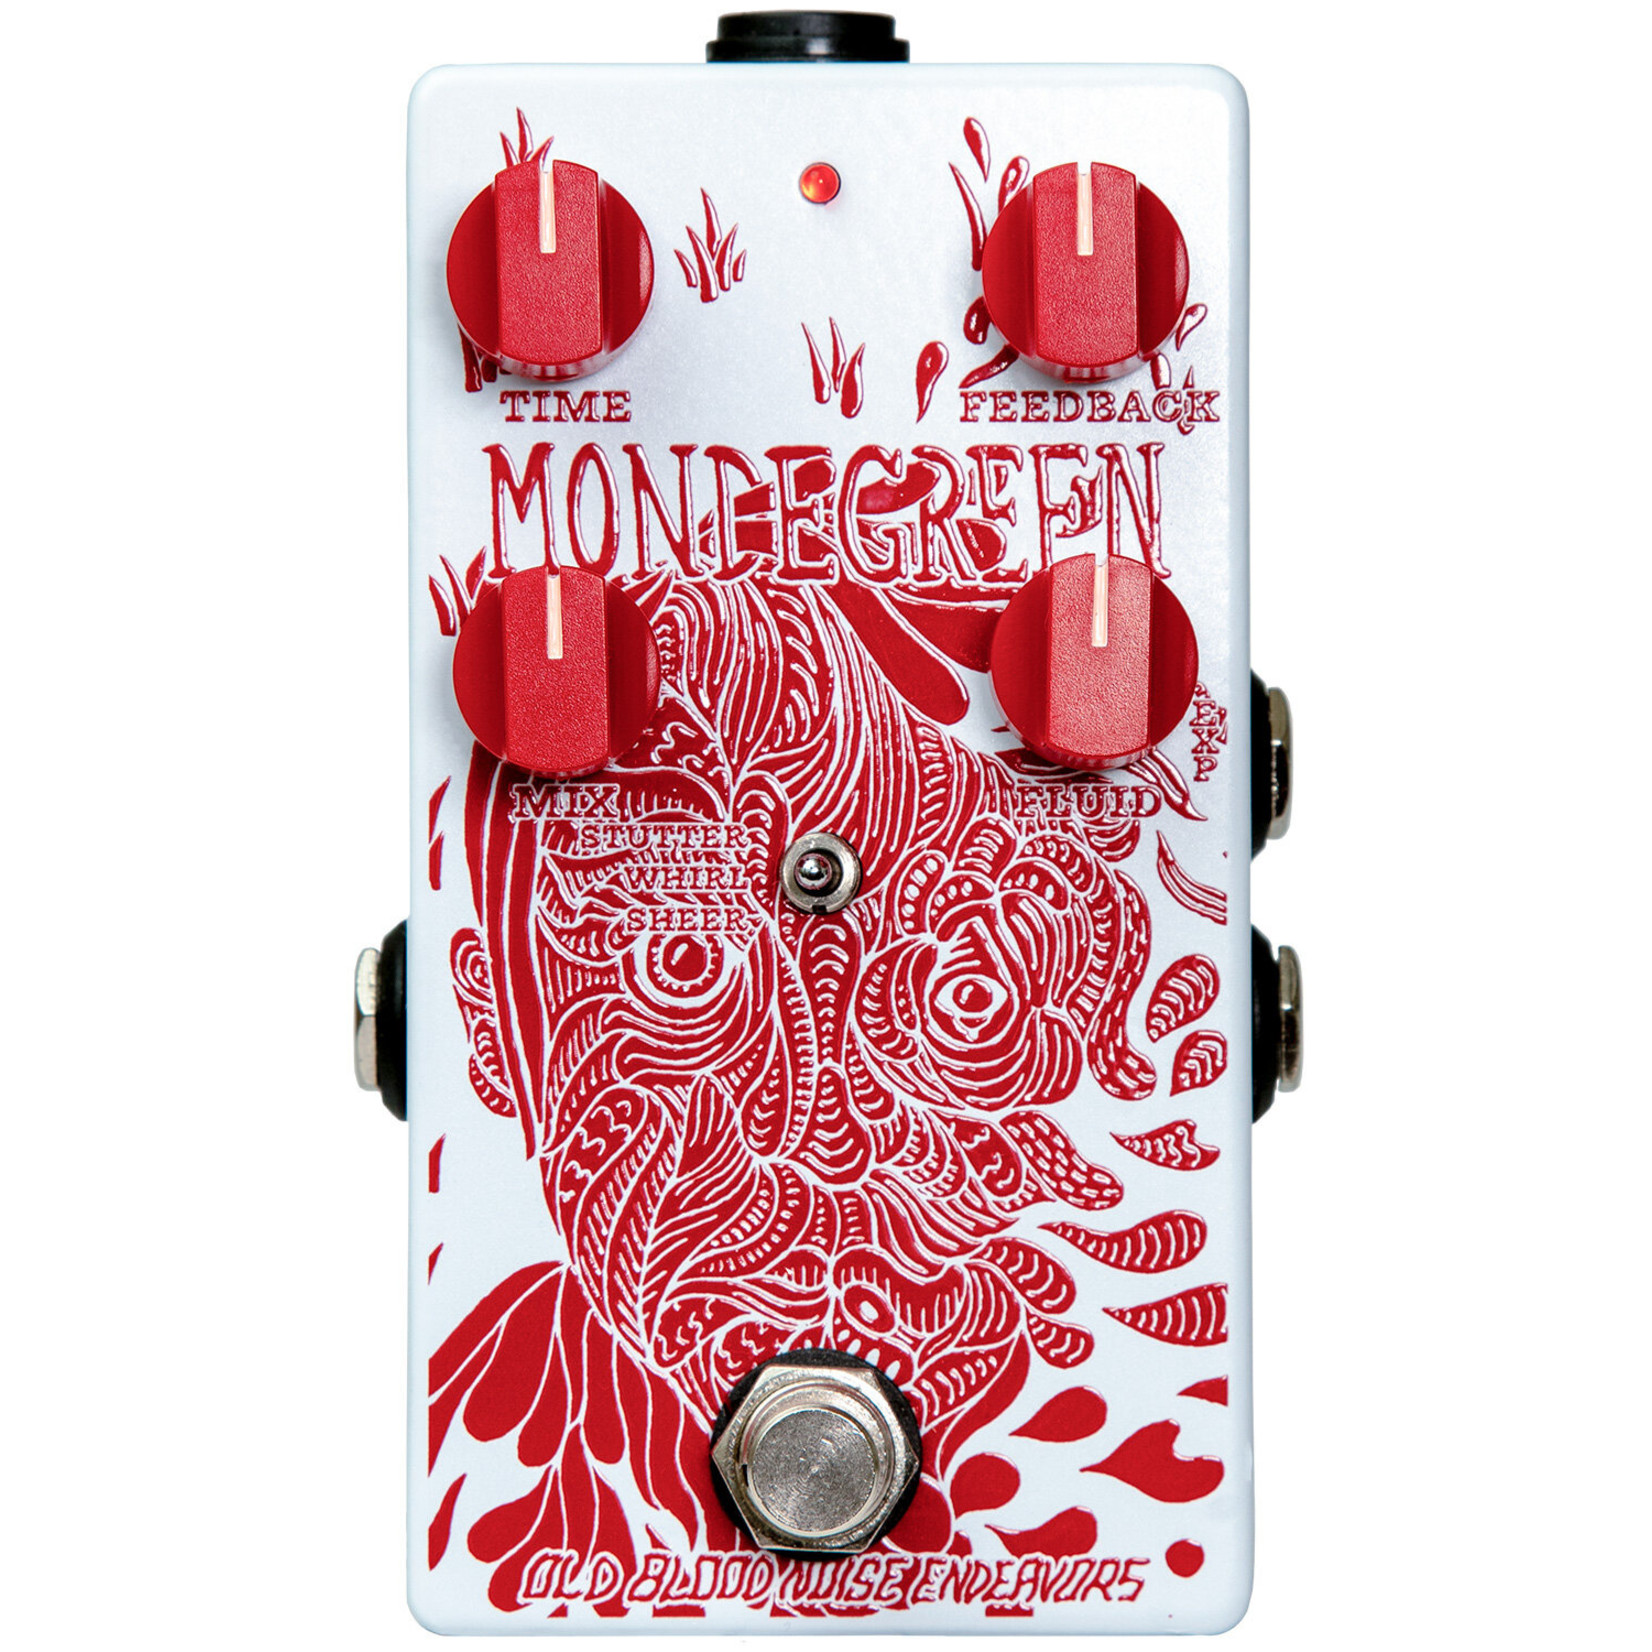 Old Blood Noise Endeavors Old Blood Noise Endeavors Mondegreen Modulated Digital Delay